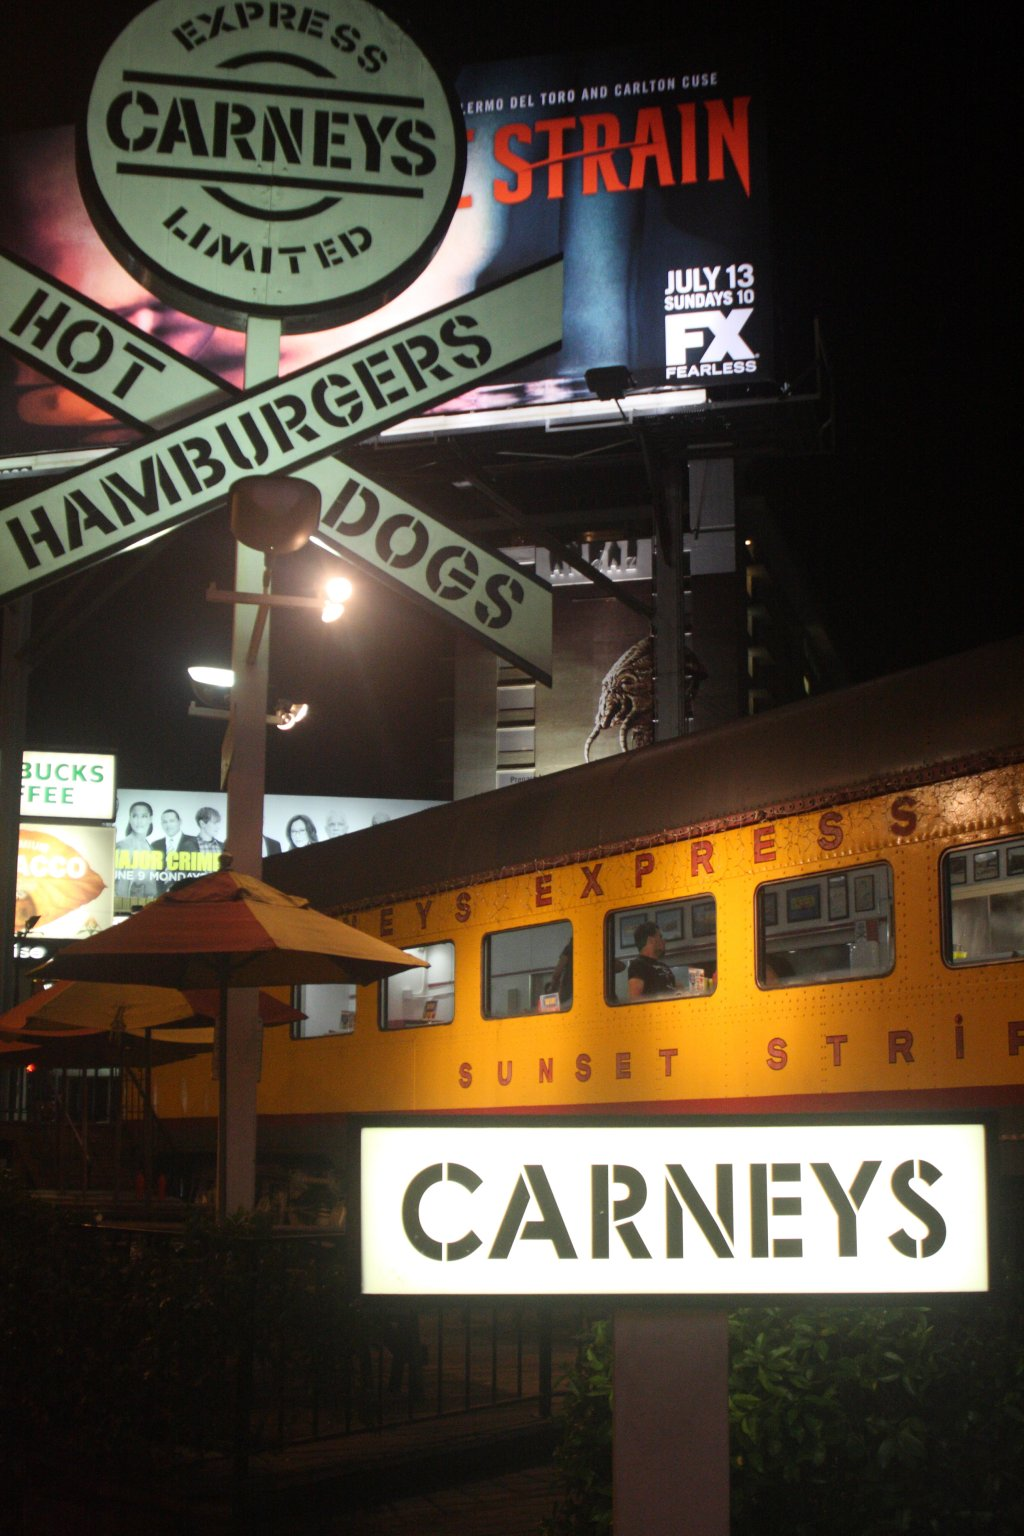 Carneys carney train on sunset strip